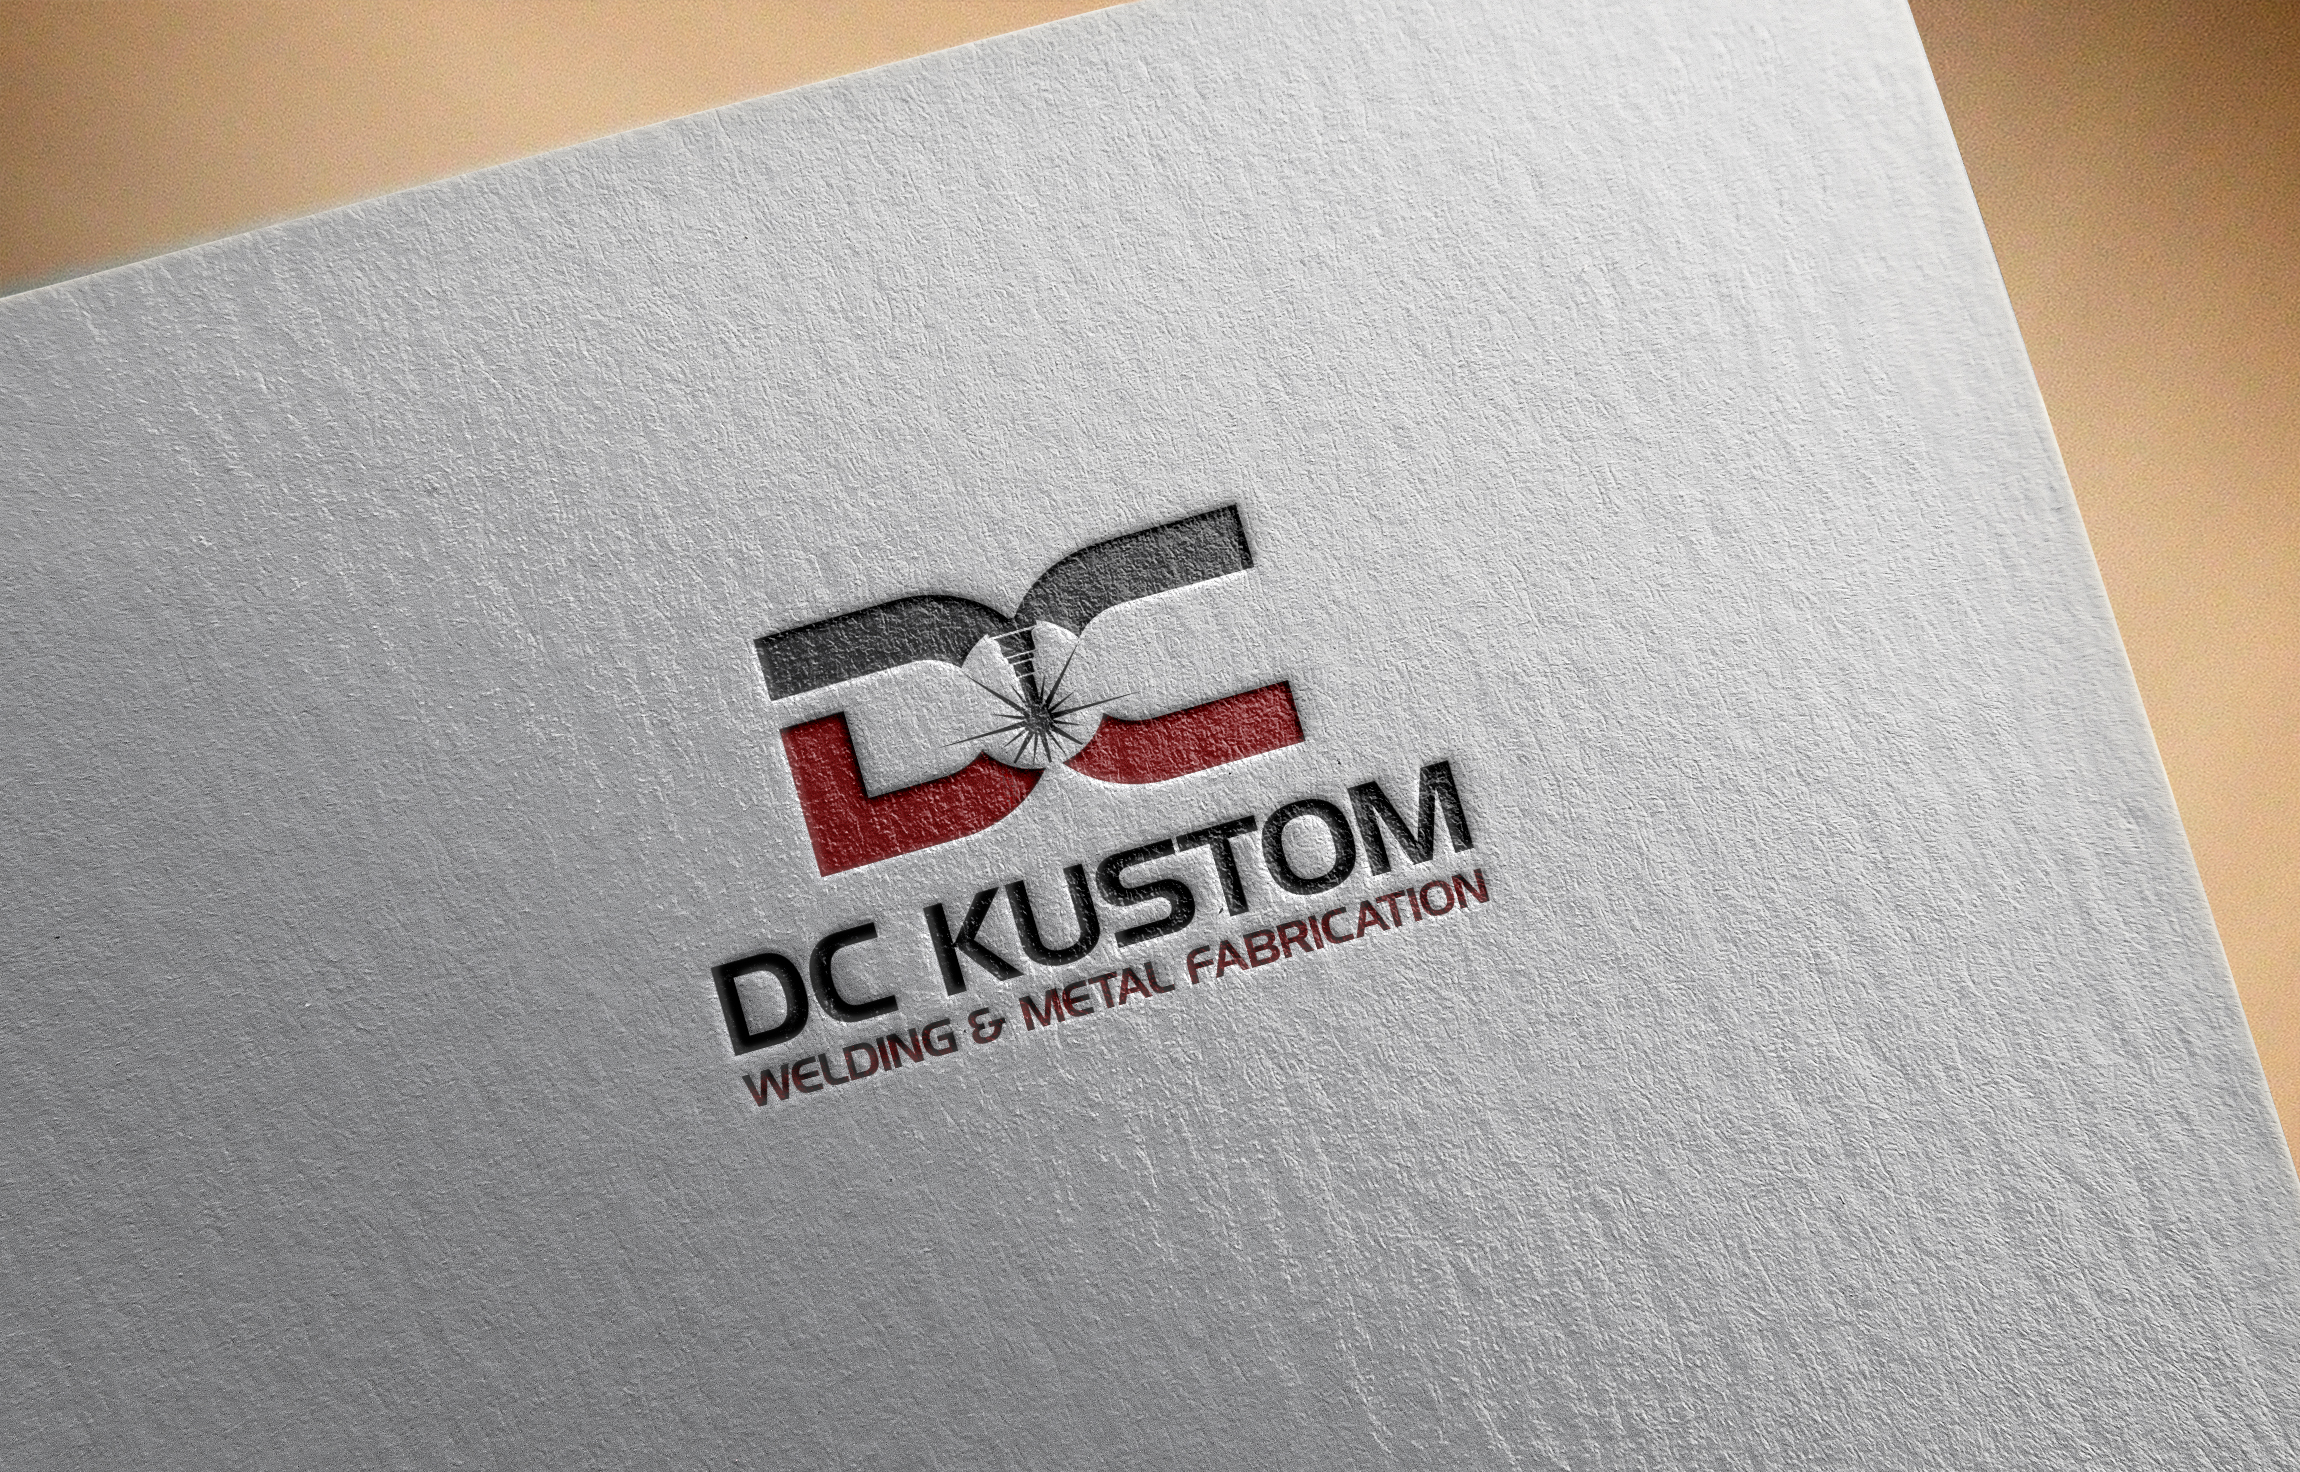 Logo Design by Raymond Garcia - Entry No. 105 in the Logo Design Contest Imaginative Logo Design for DC KUSTOM WELDING & METAL FABRICATION.